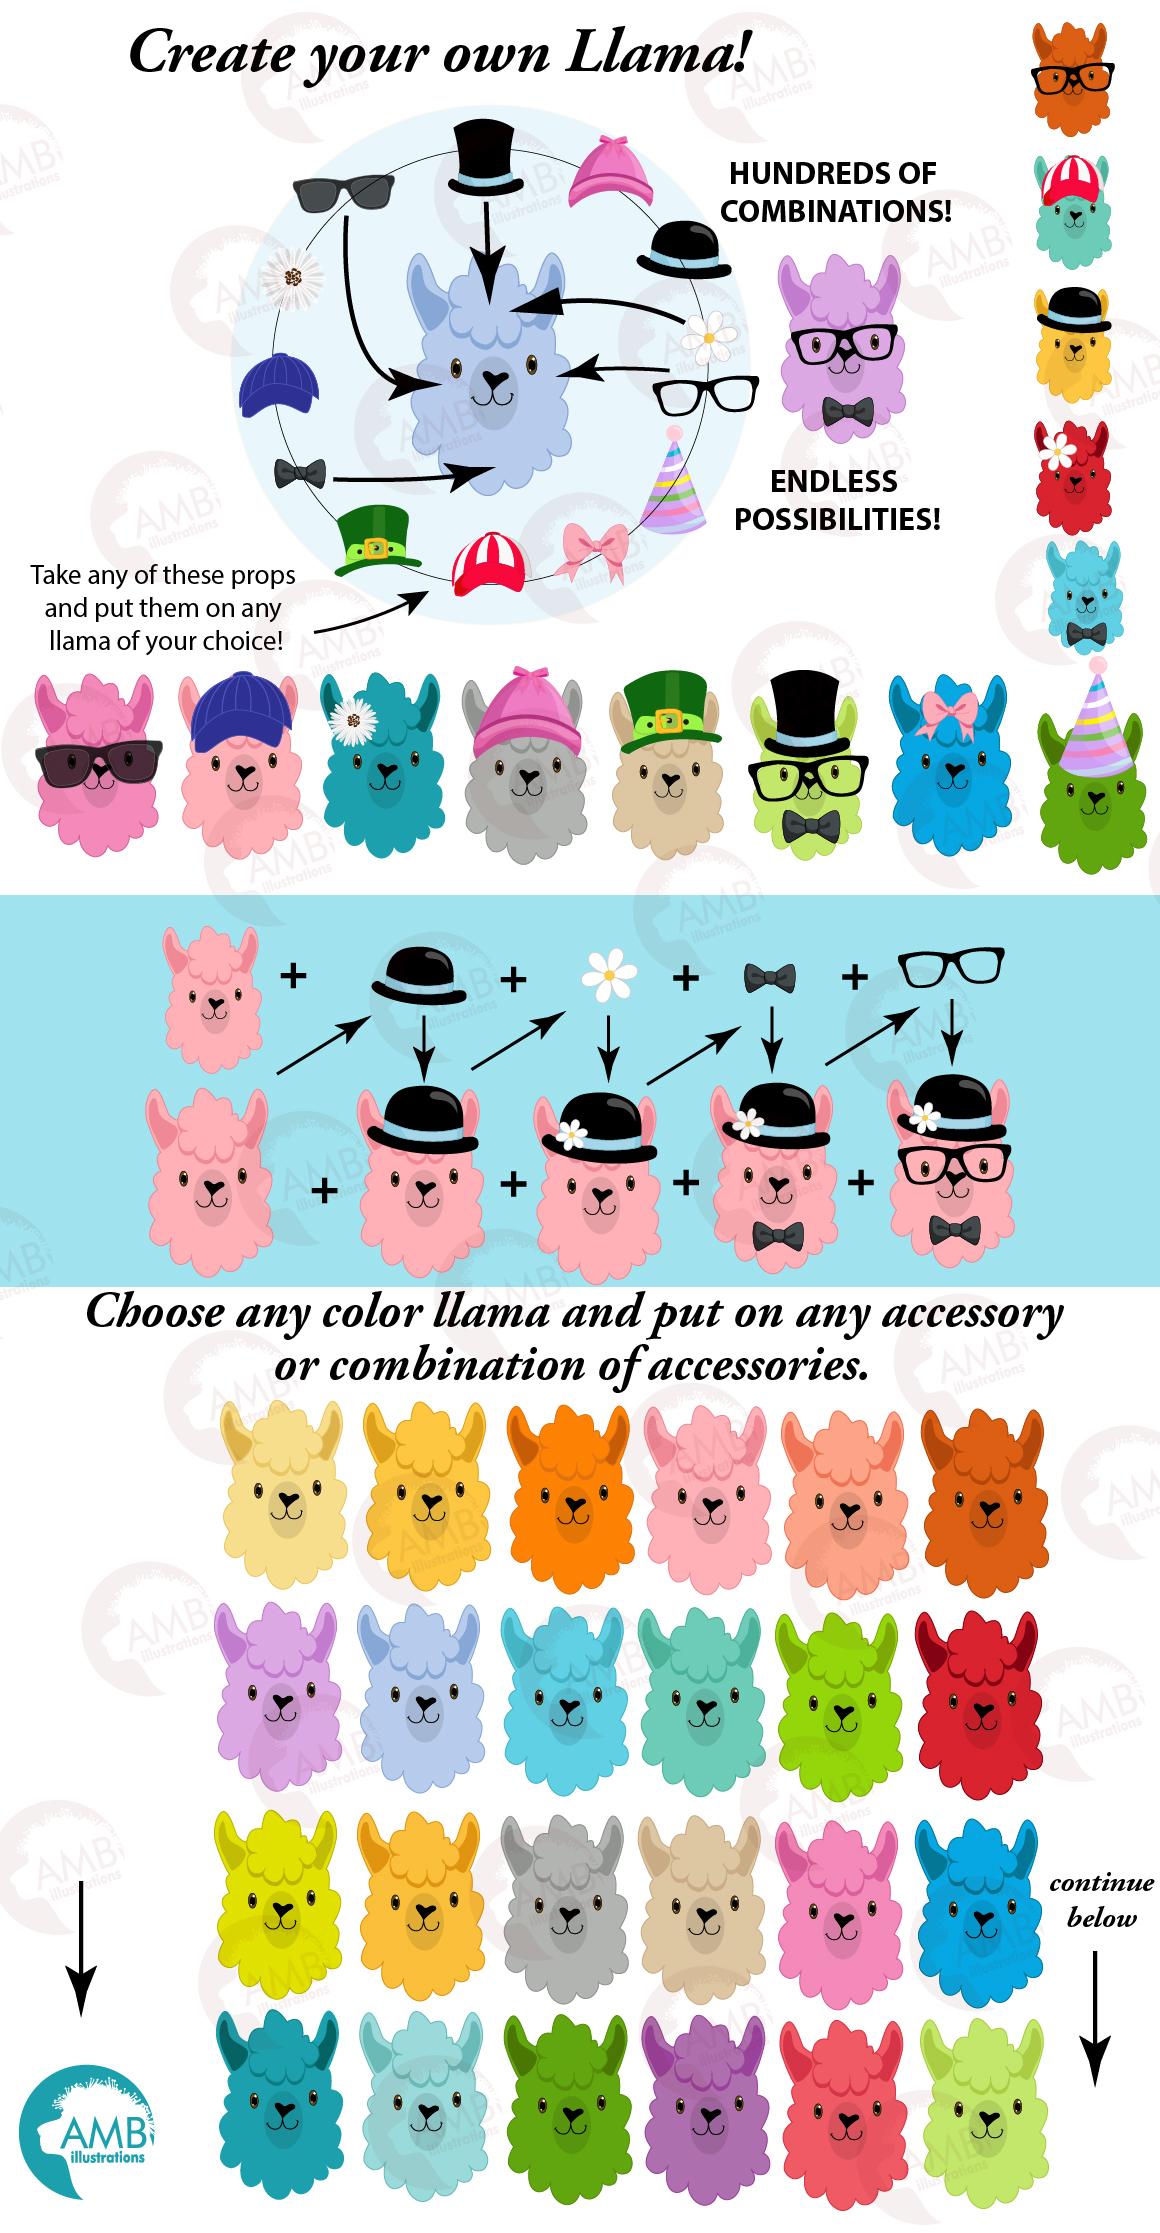 Create your own LLama, DIY Llama Funny Faces clipart, graphics, illustrations, AMB-2376 example image 7